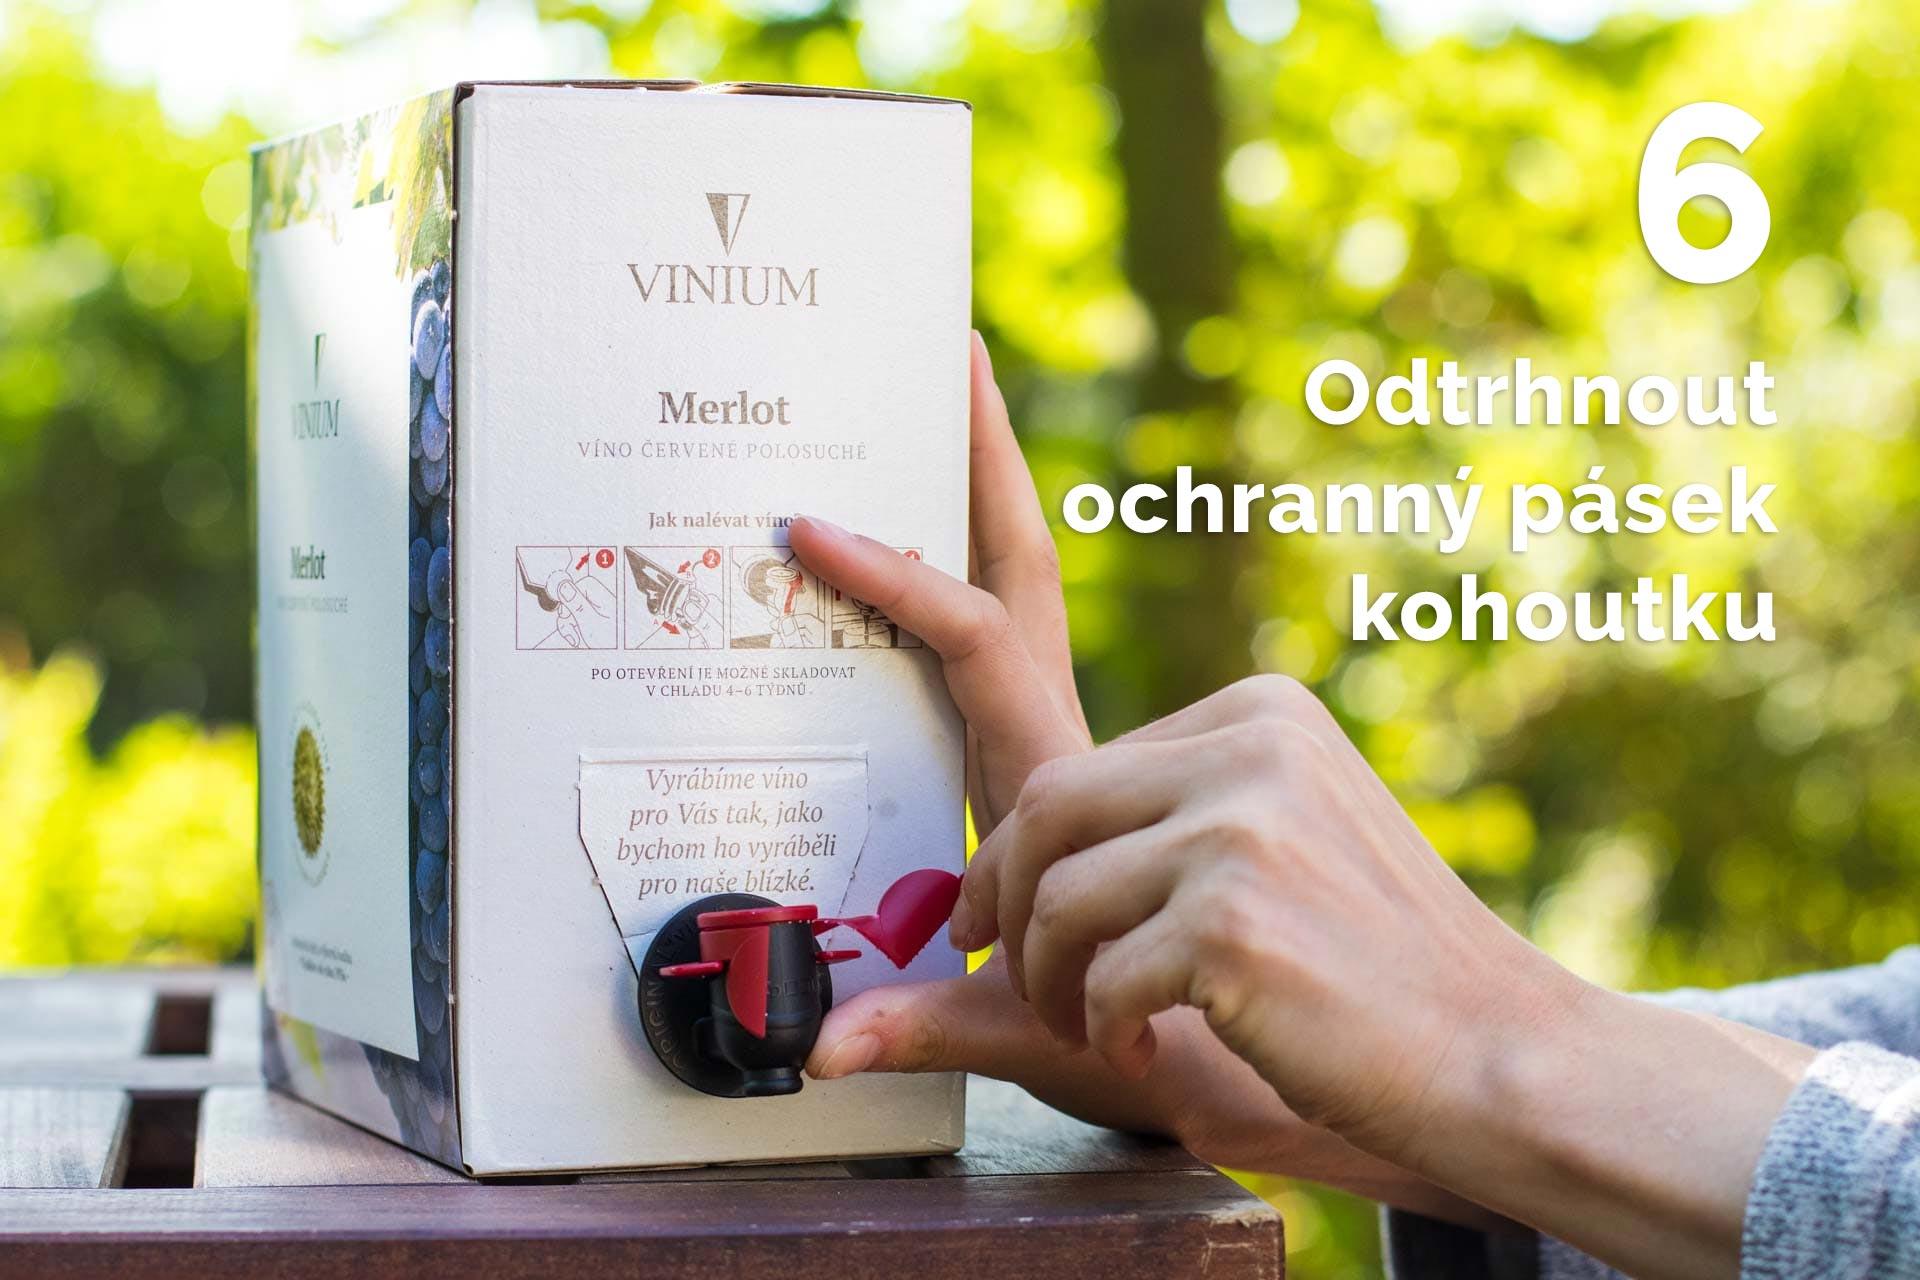 jak otevřít bag in box 6, vinium, návod, víno